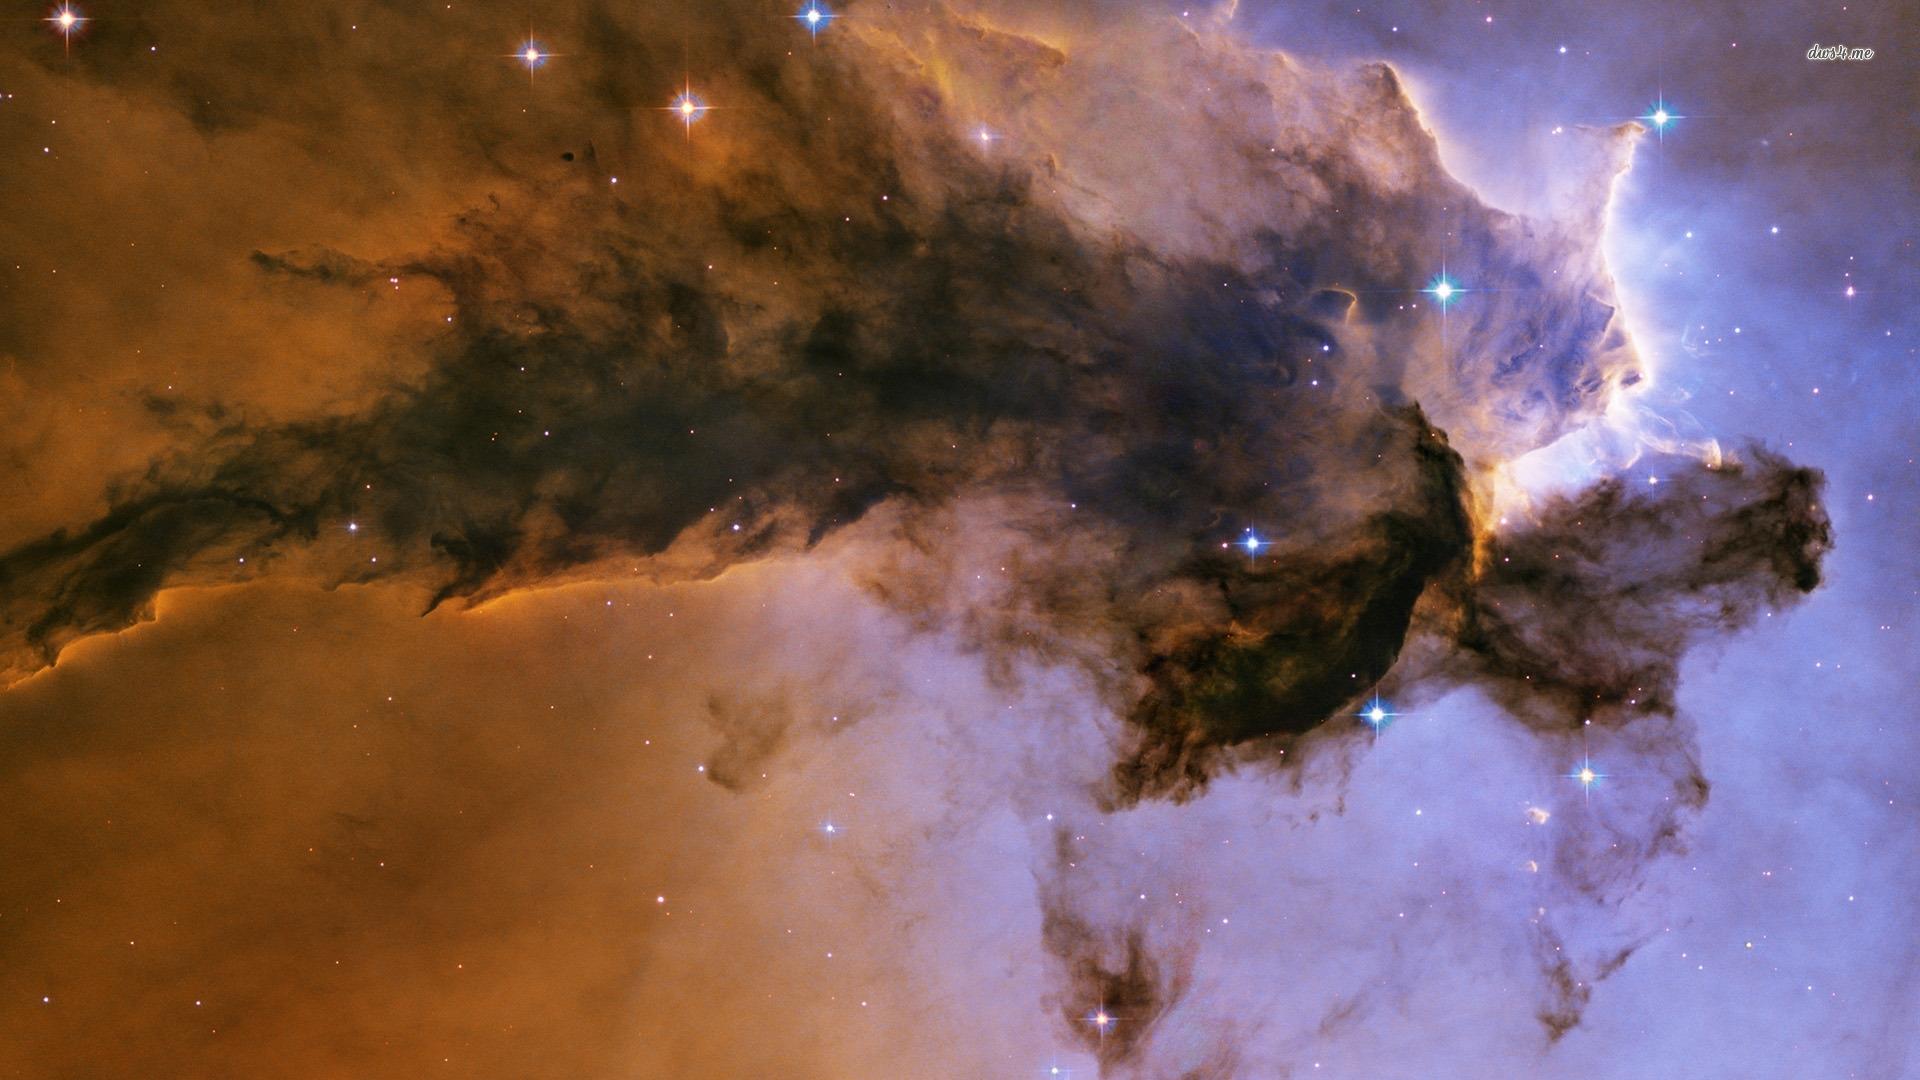 eagle nebula widescreen desktop wallpaper 1398 - amazing wallpaperz